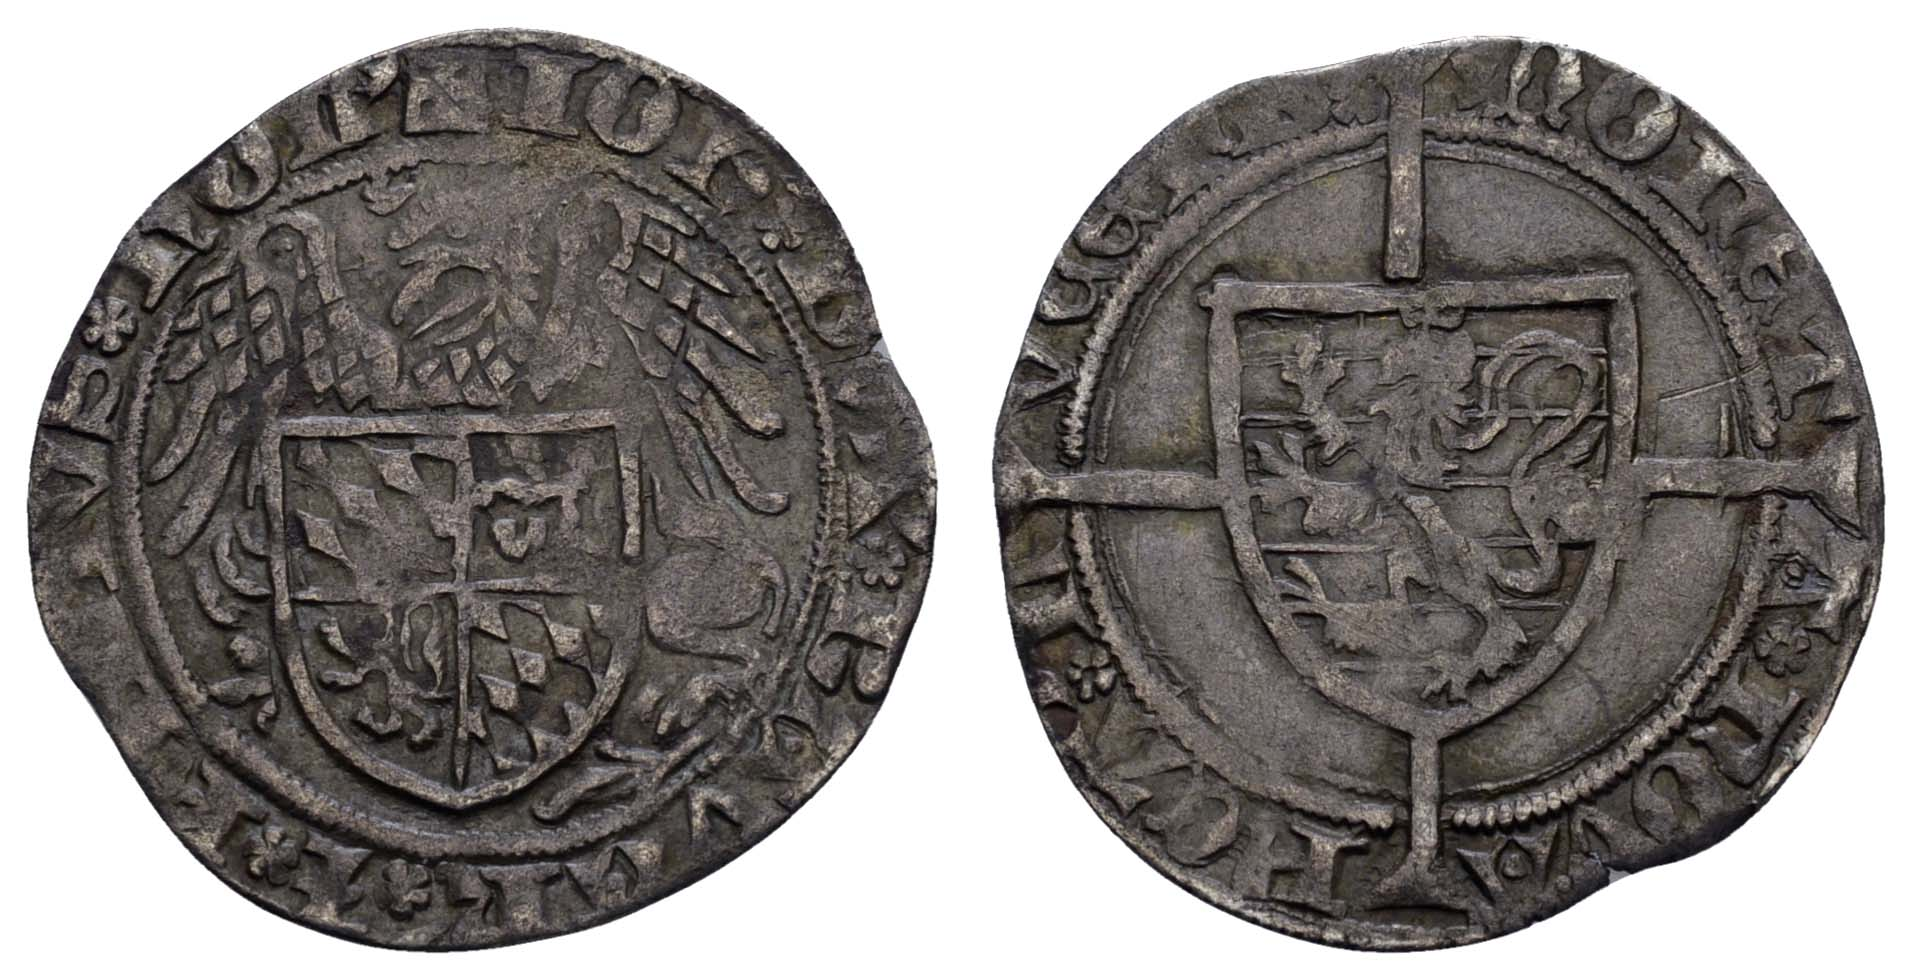 Lot 1394 - europa bis 1799 - Luxemburg -  Auktionshaus Ulrich Felzmann GmbH & Co. KG Coins single lots